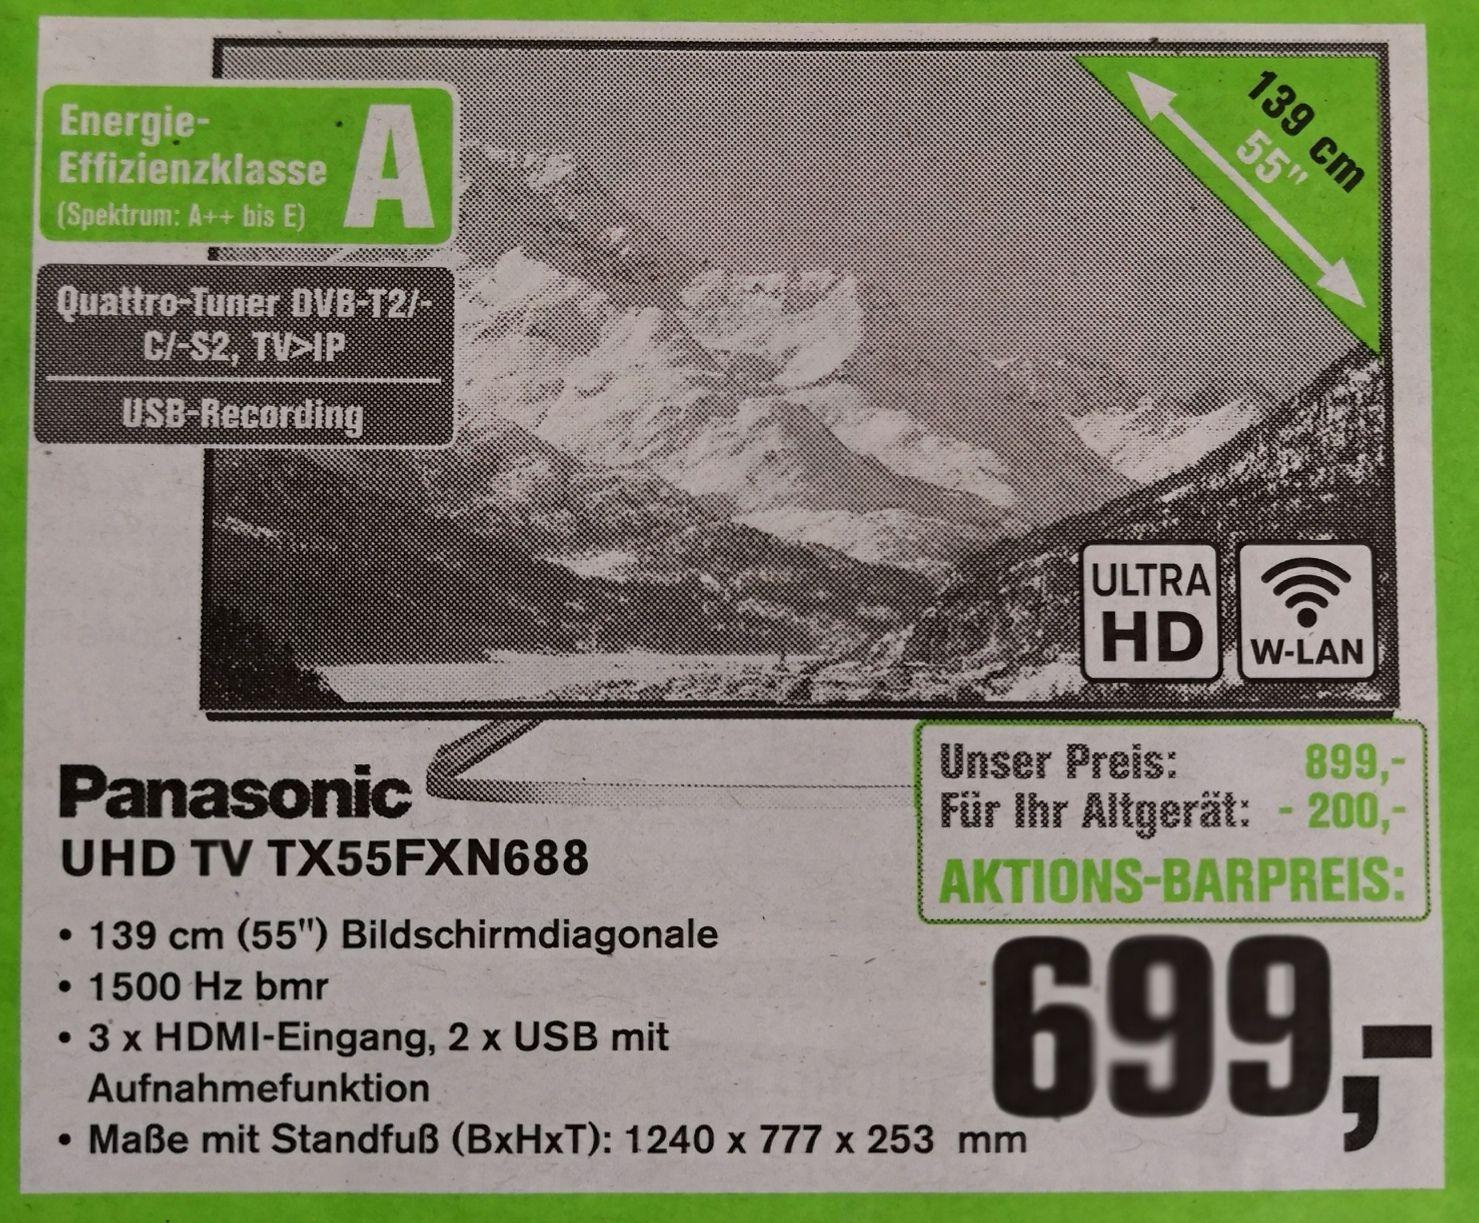 [Lokal Saarland, Stuttgart, Leipzig] Panasonic TX55FXN688 Alpahtecc